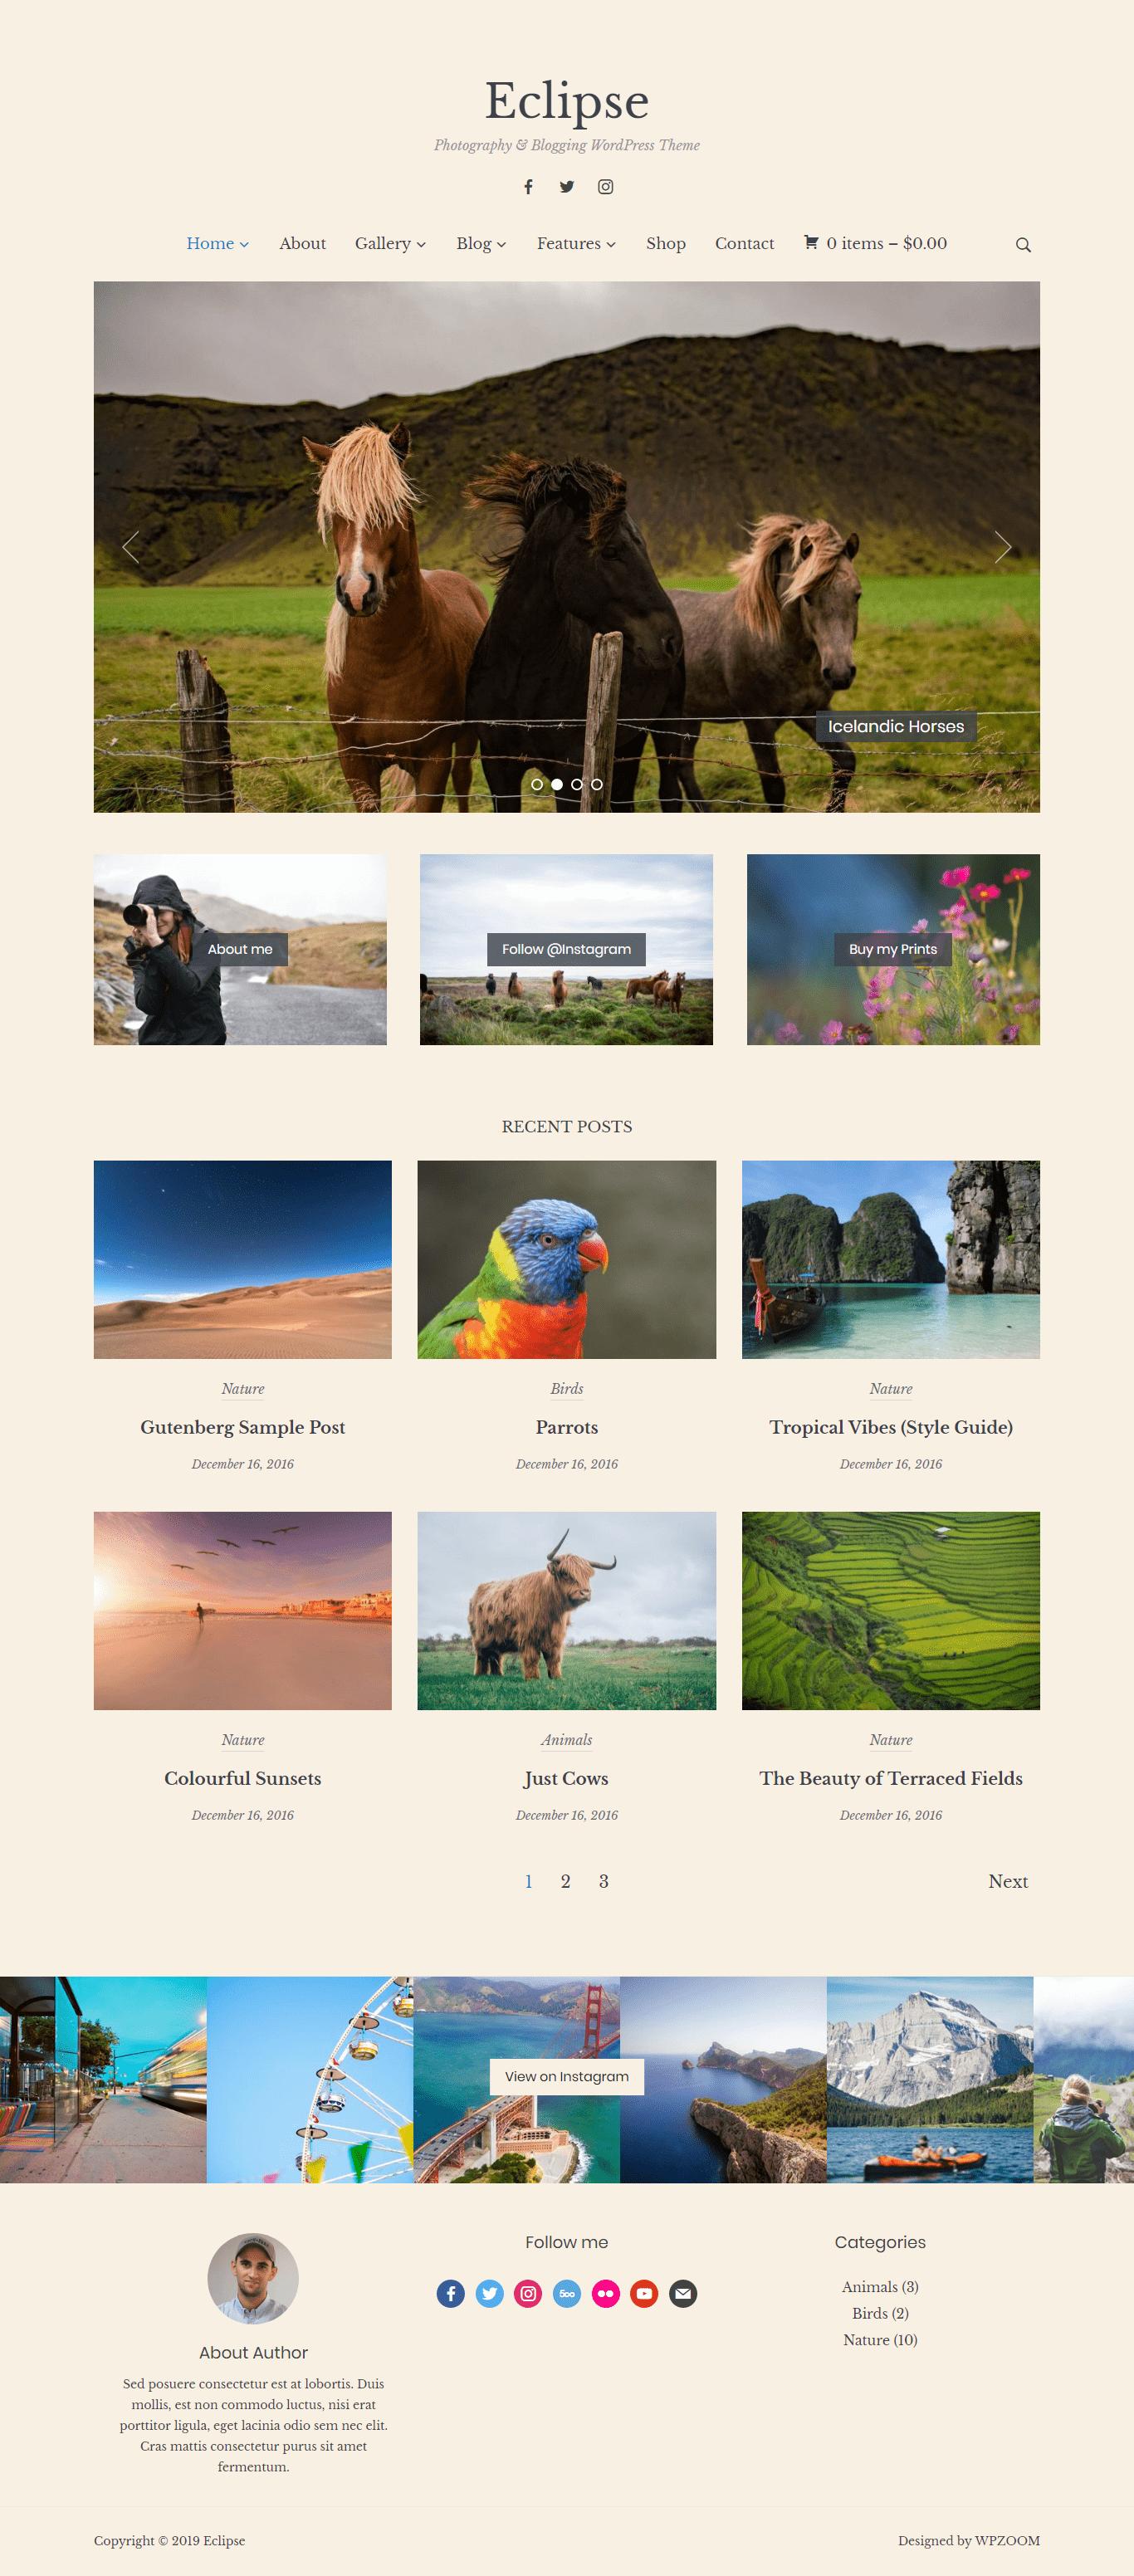 Eclipse- Elegant Photography and Blogging WordPress Theme